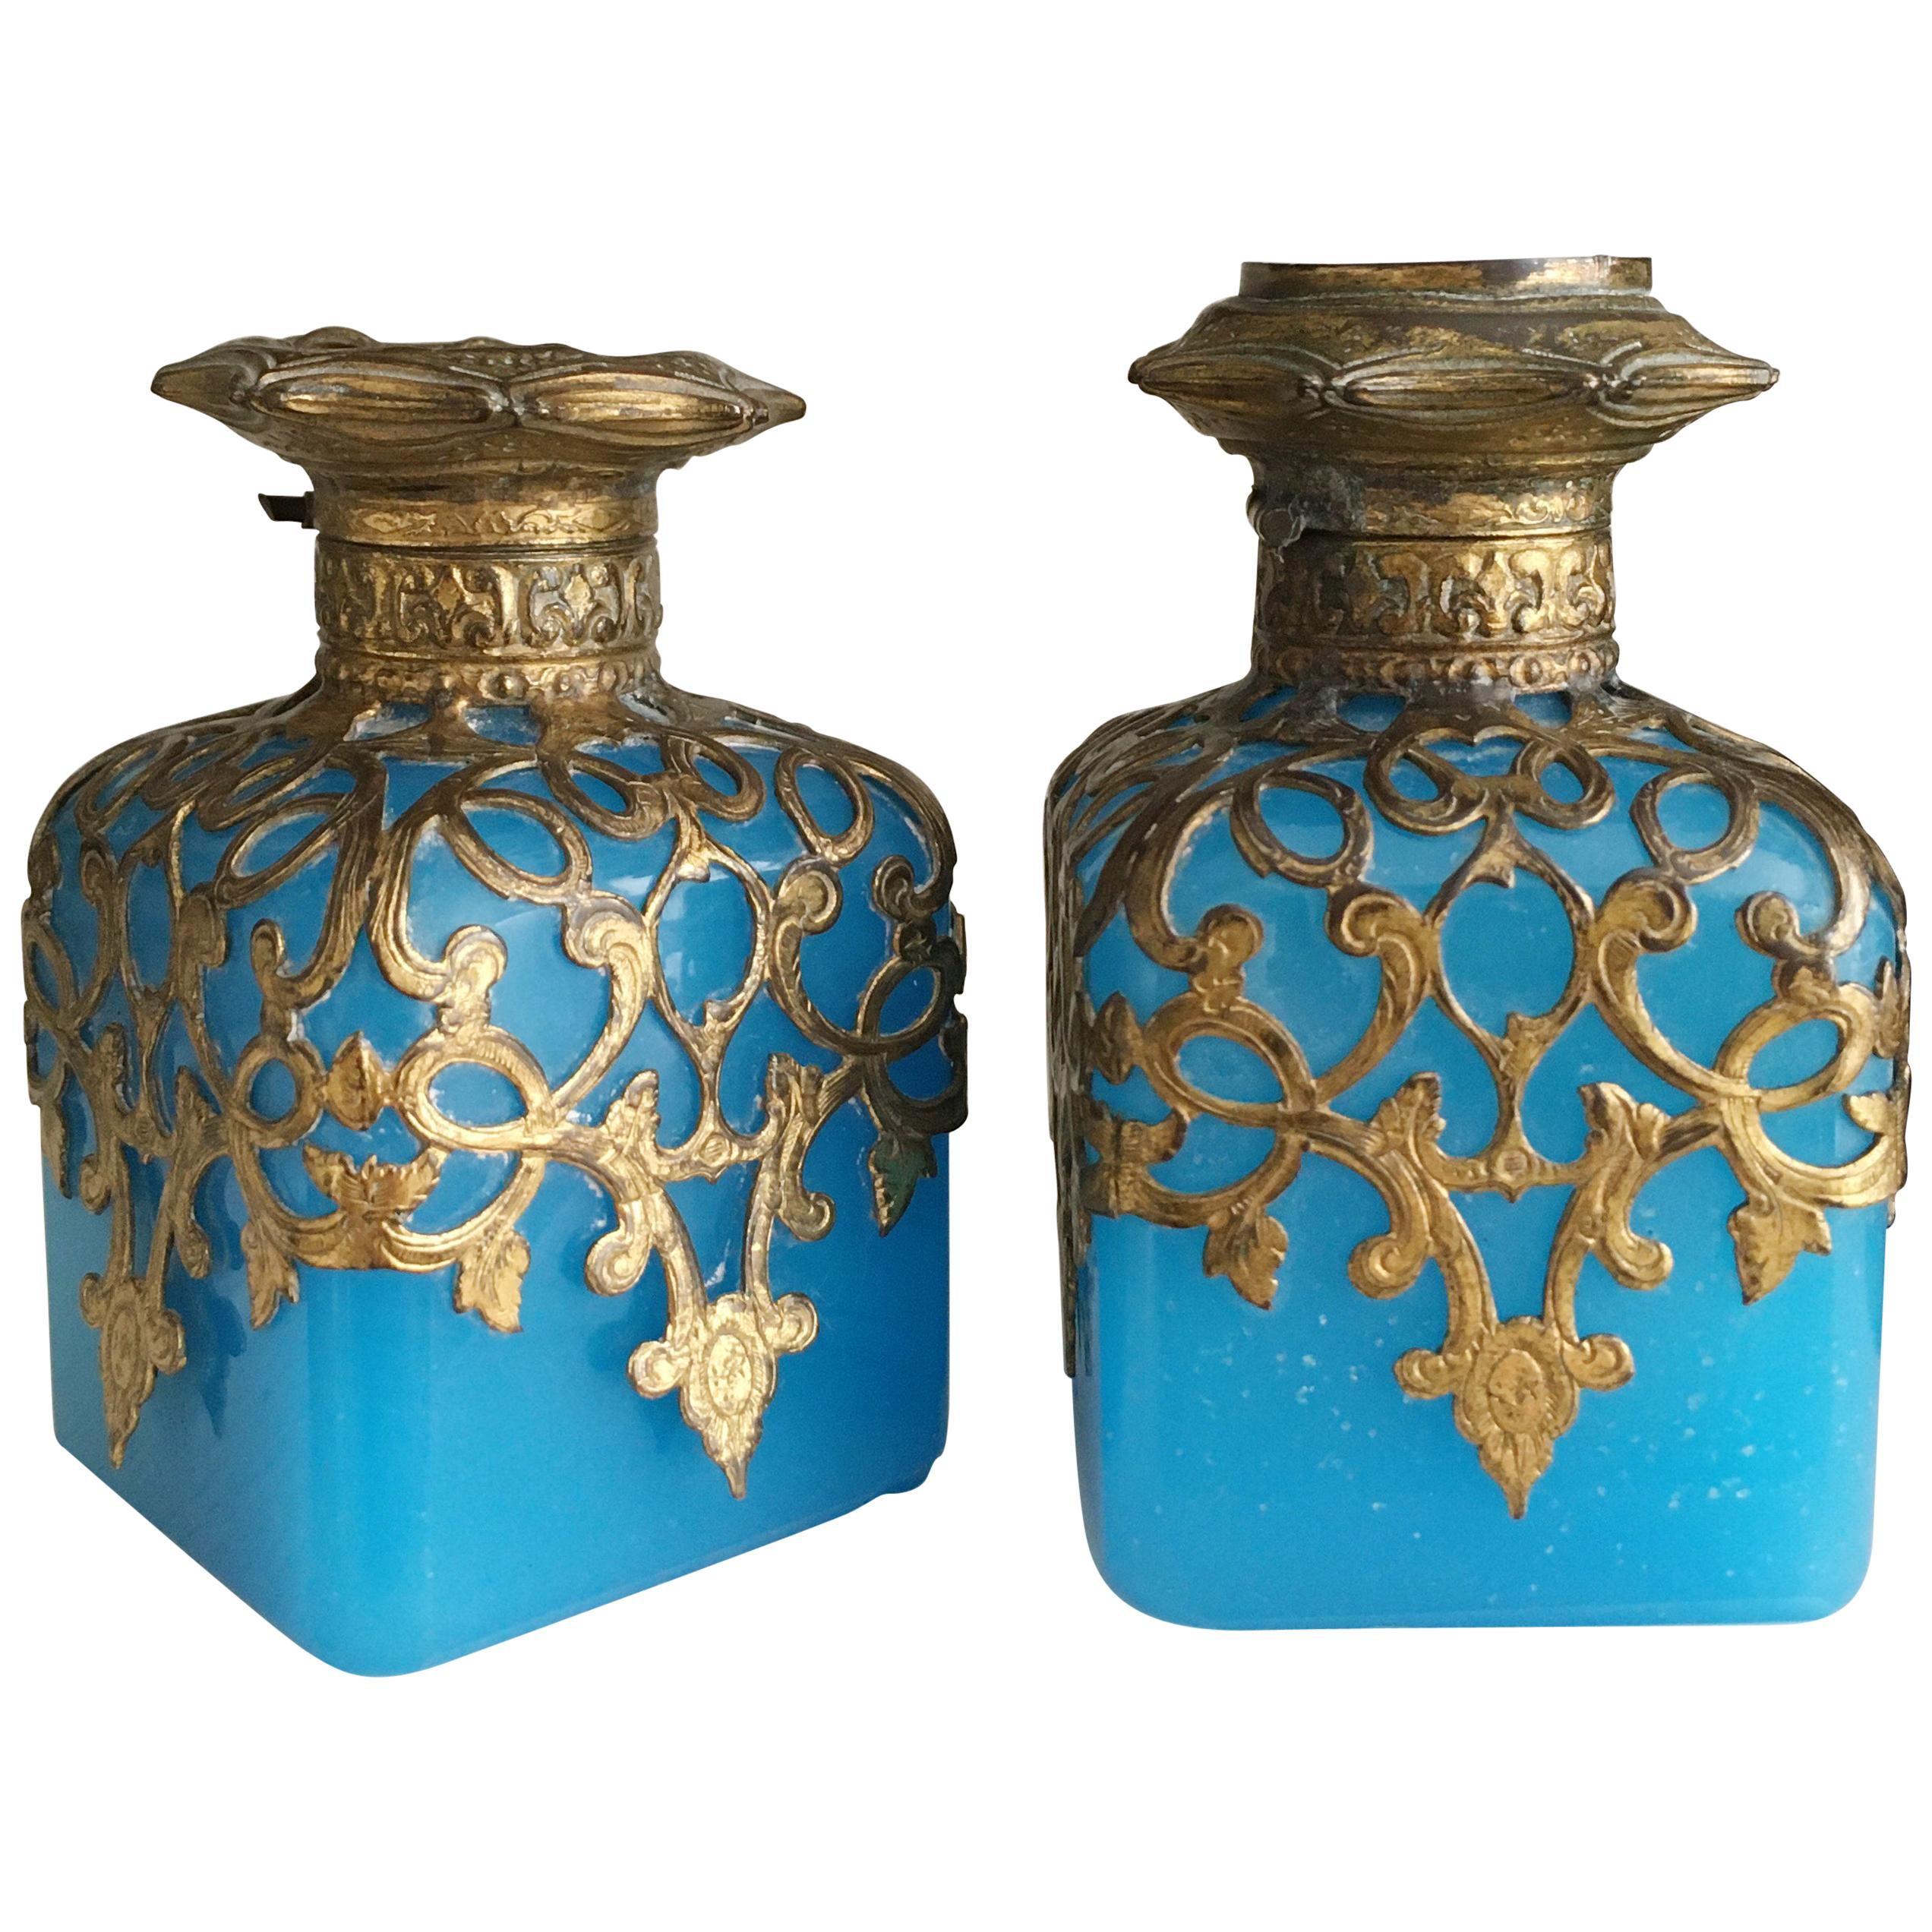 Grand Tour French Opaline Perfume Bottles, circa 1860